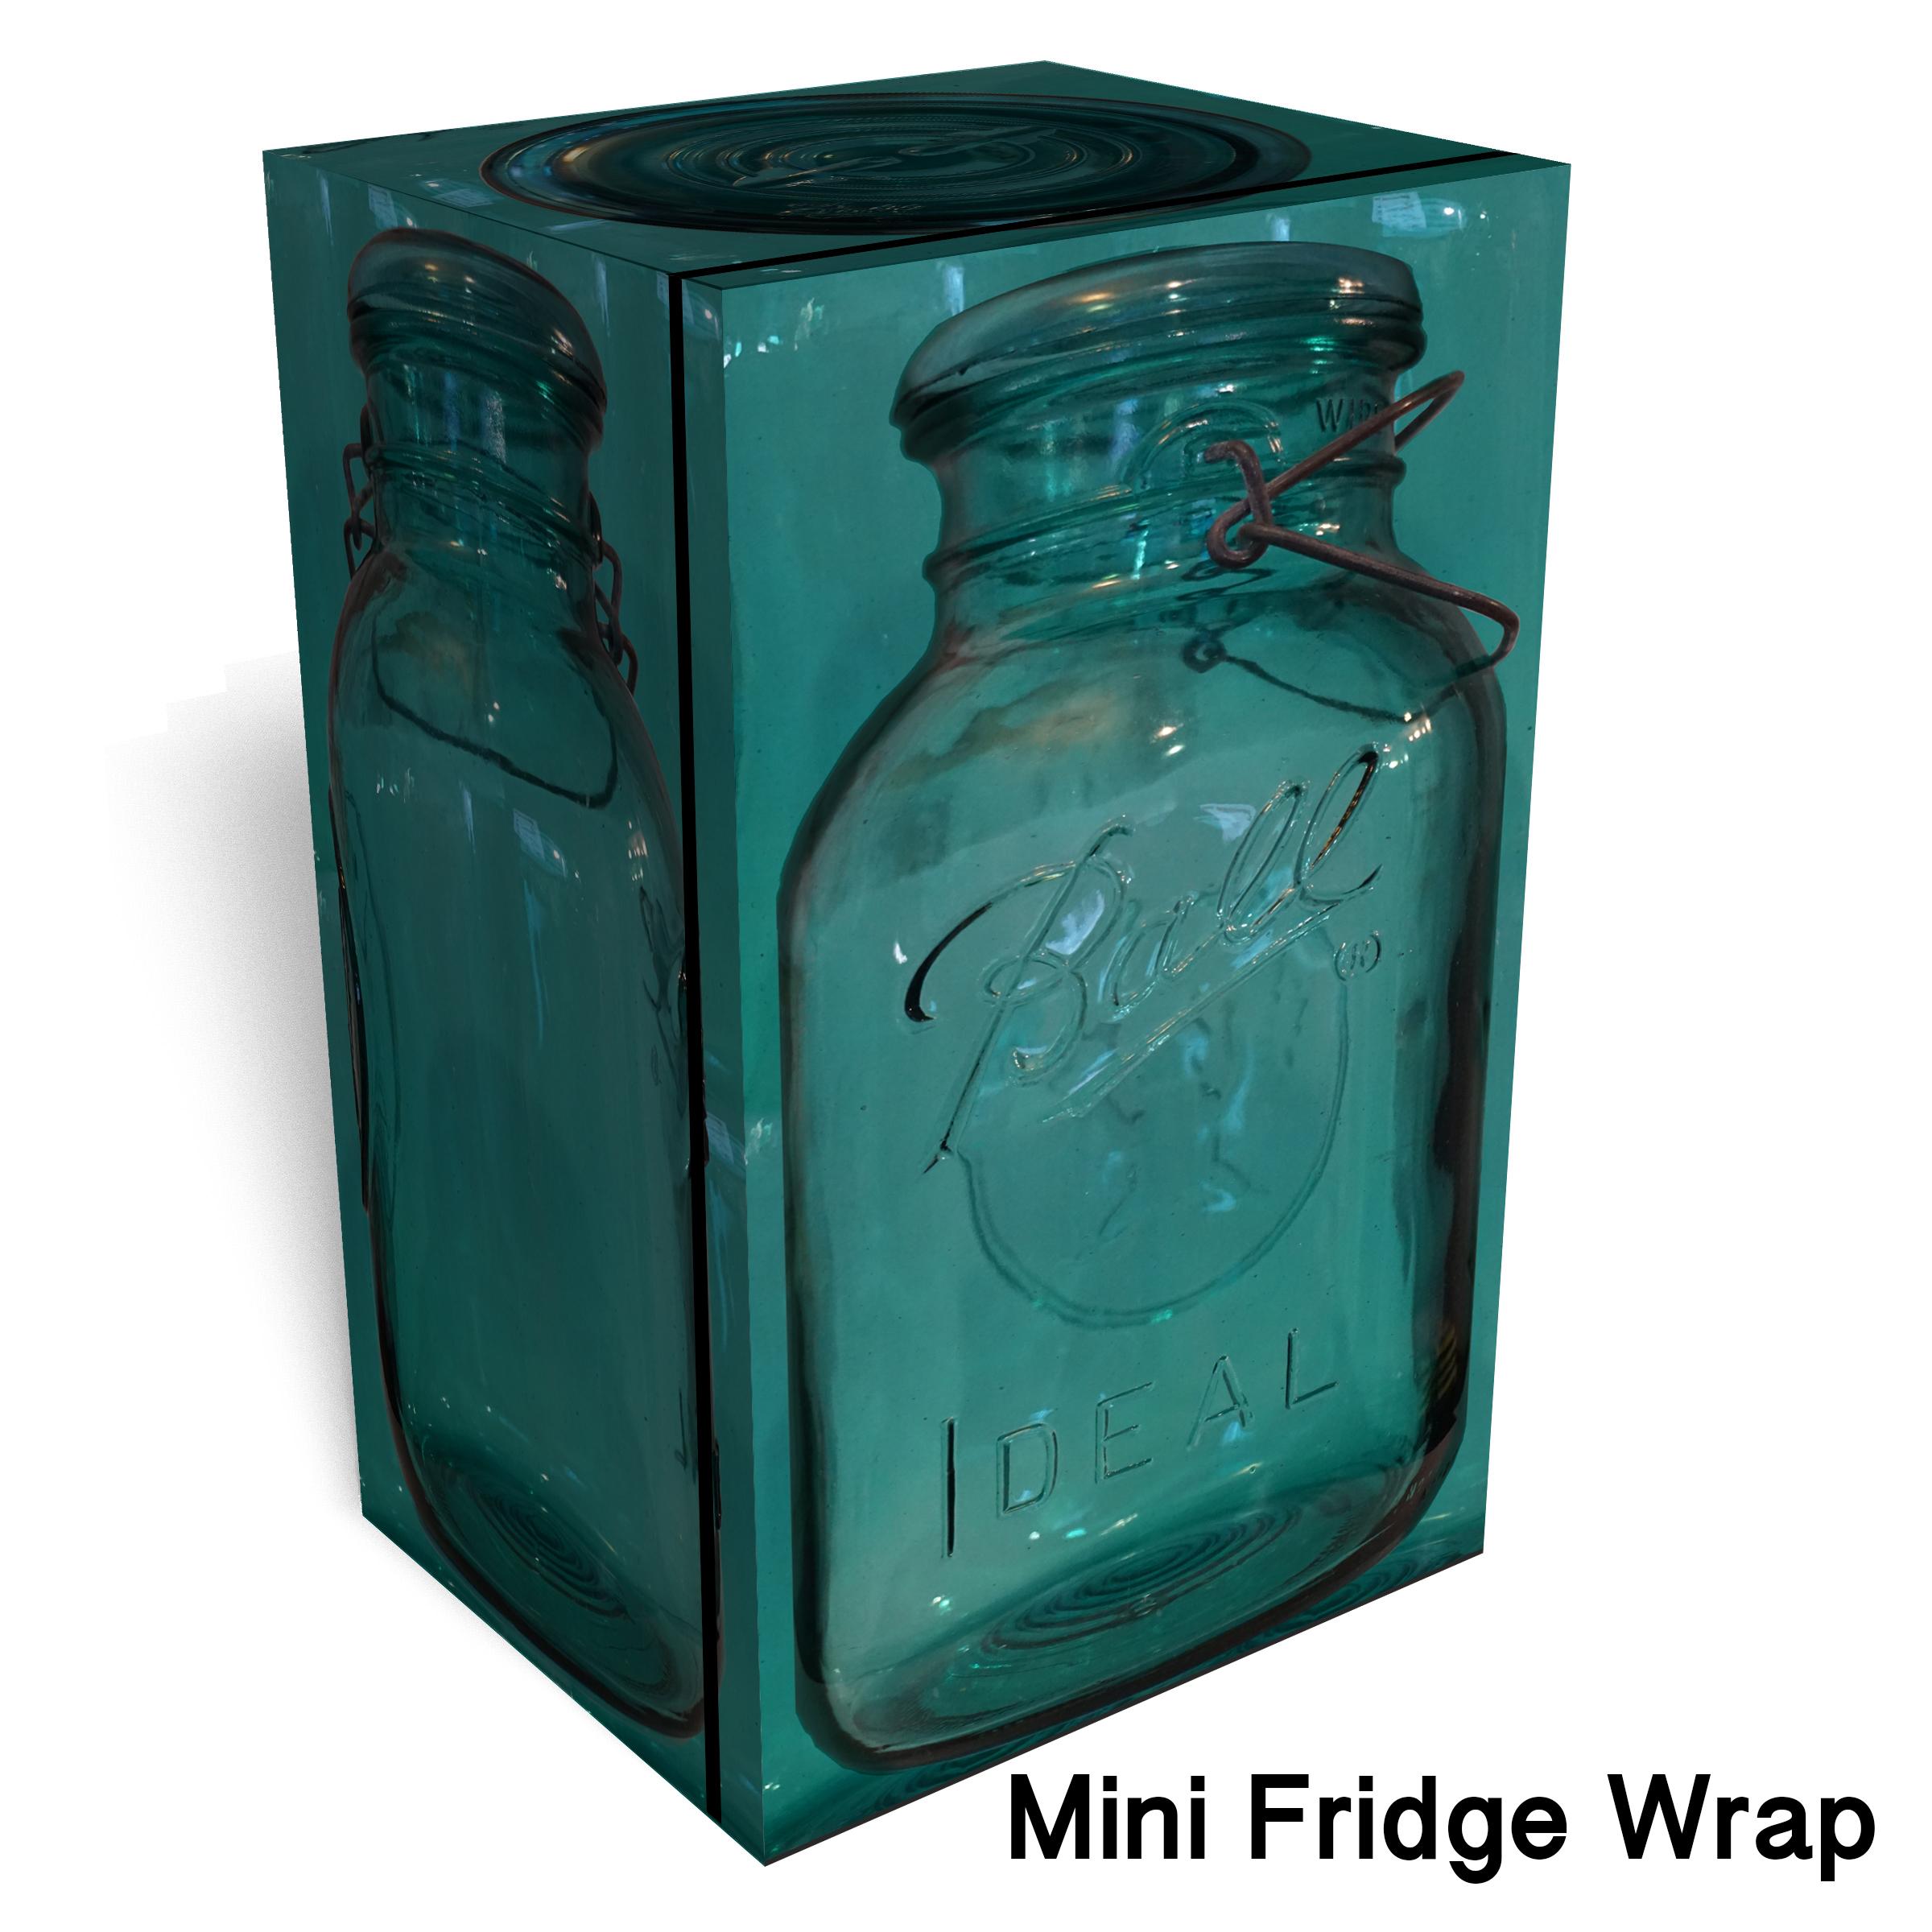 Ball Vintage Mason Jar Mini Fridge Wrap